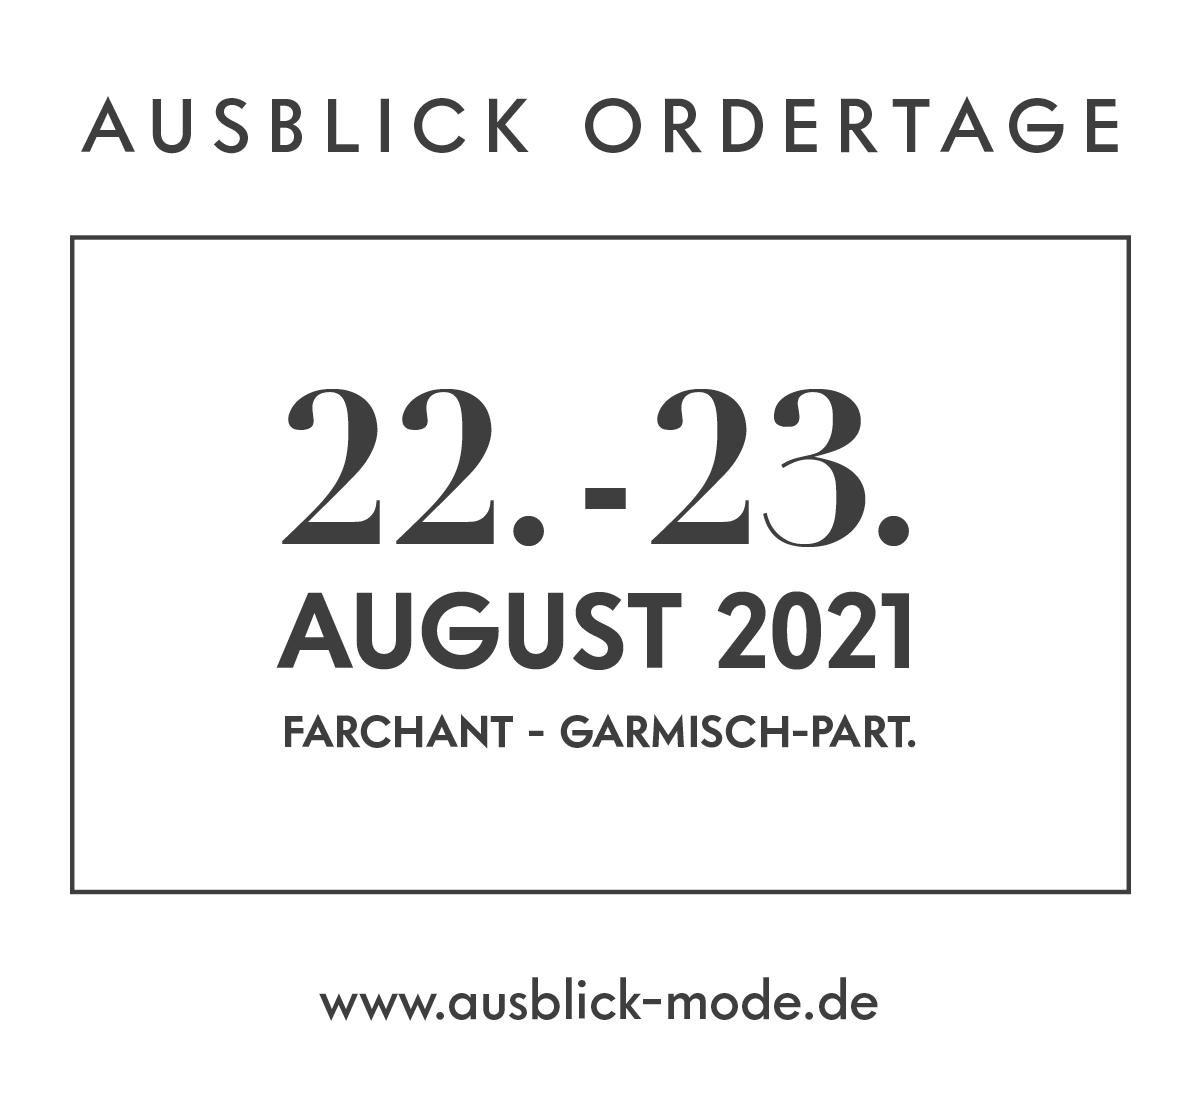 Ausblick Ordertage August 2021 Farchant